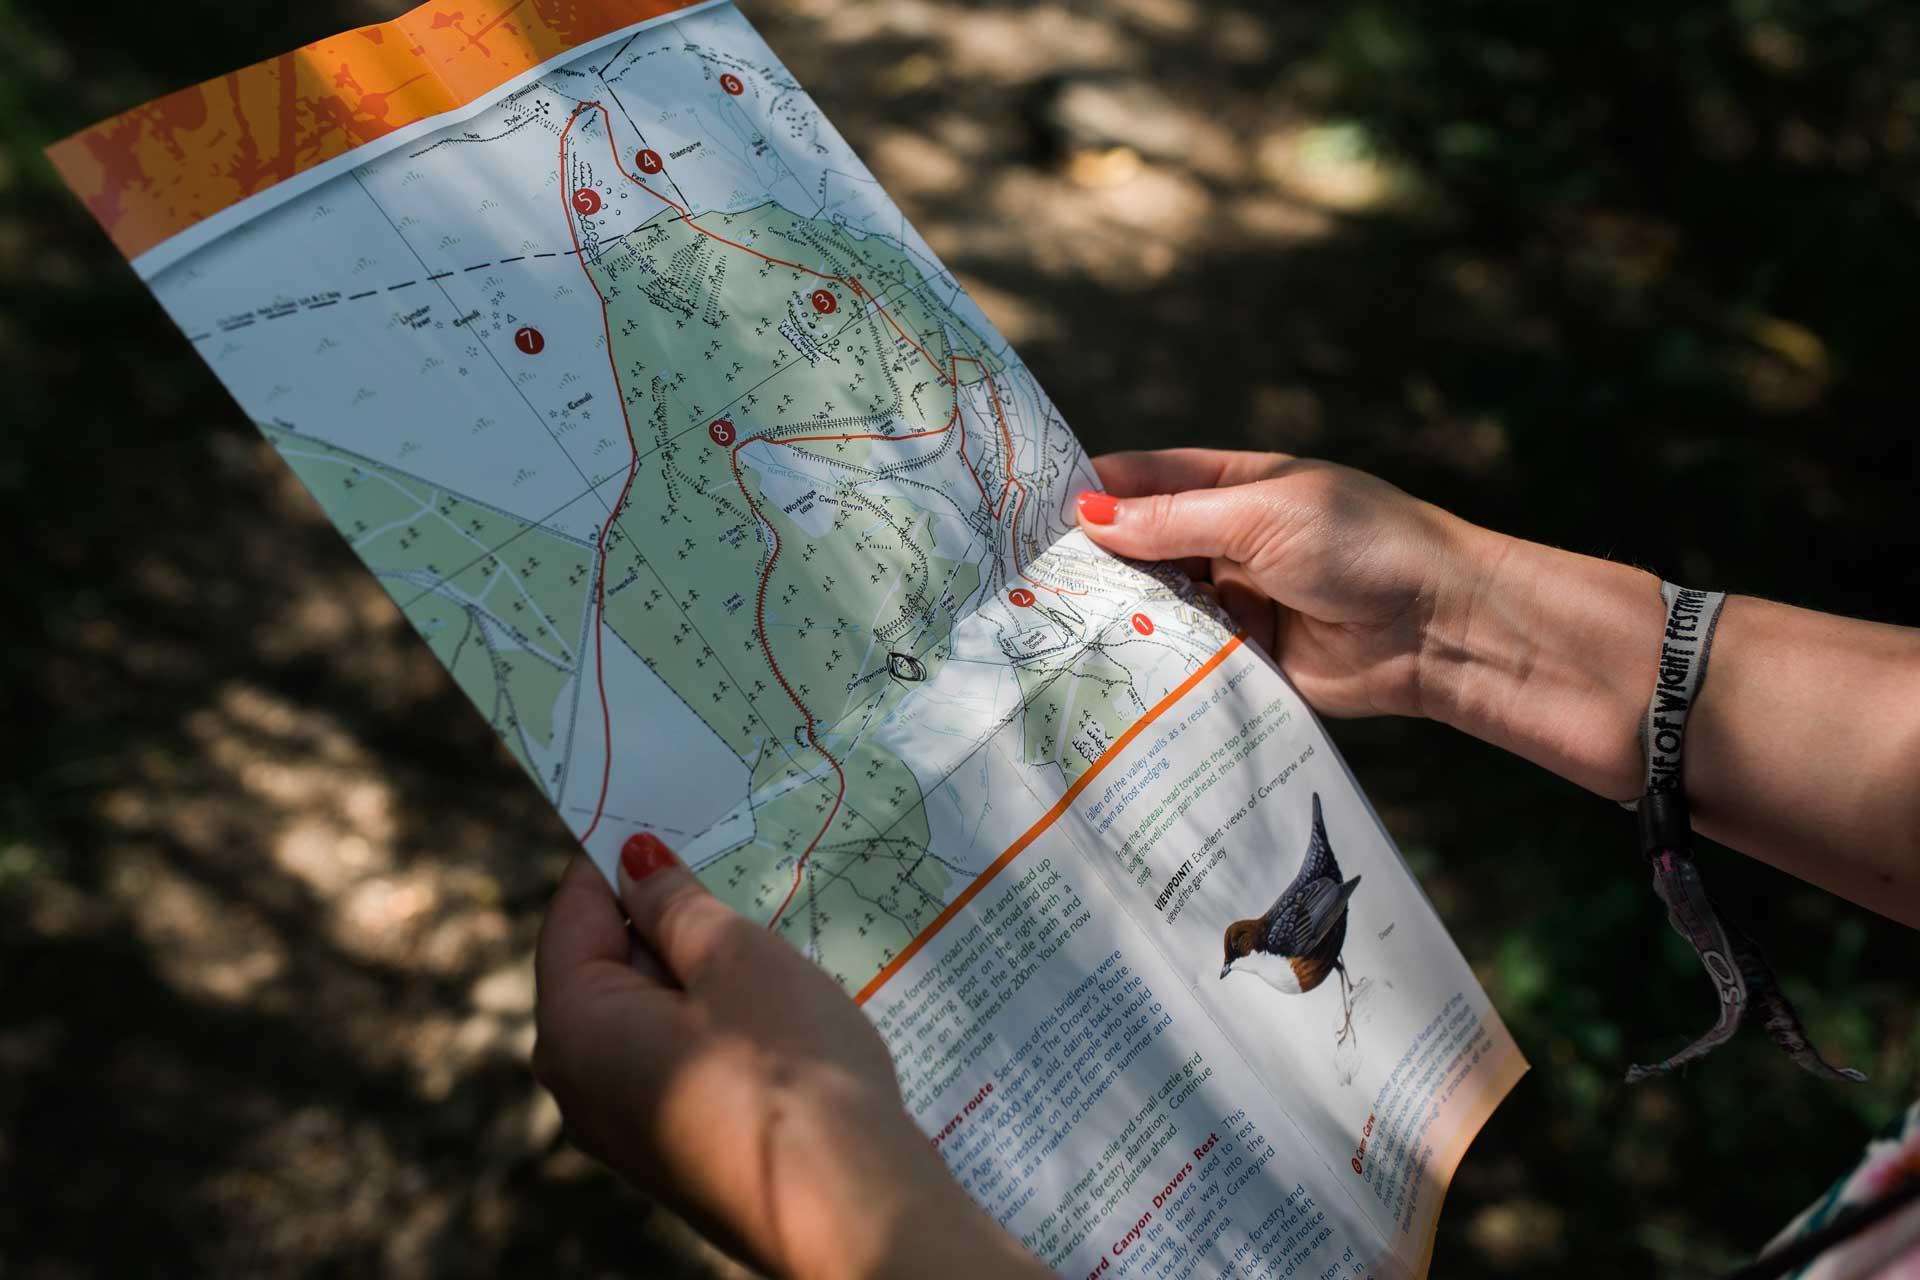 A person examining a map